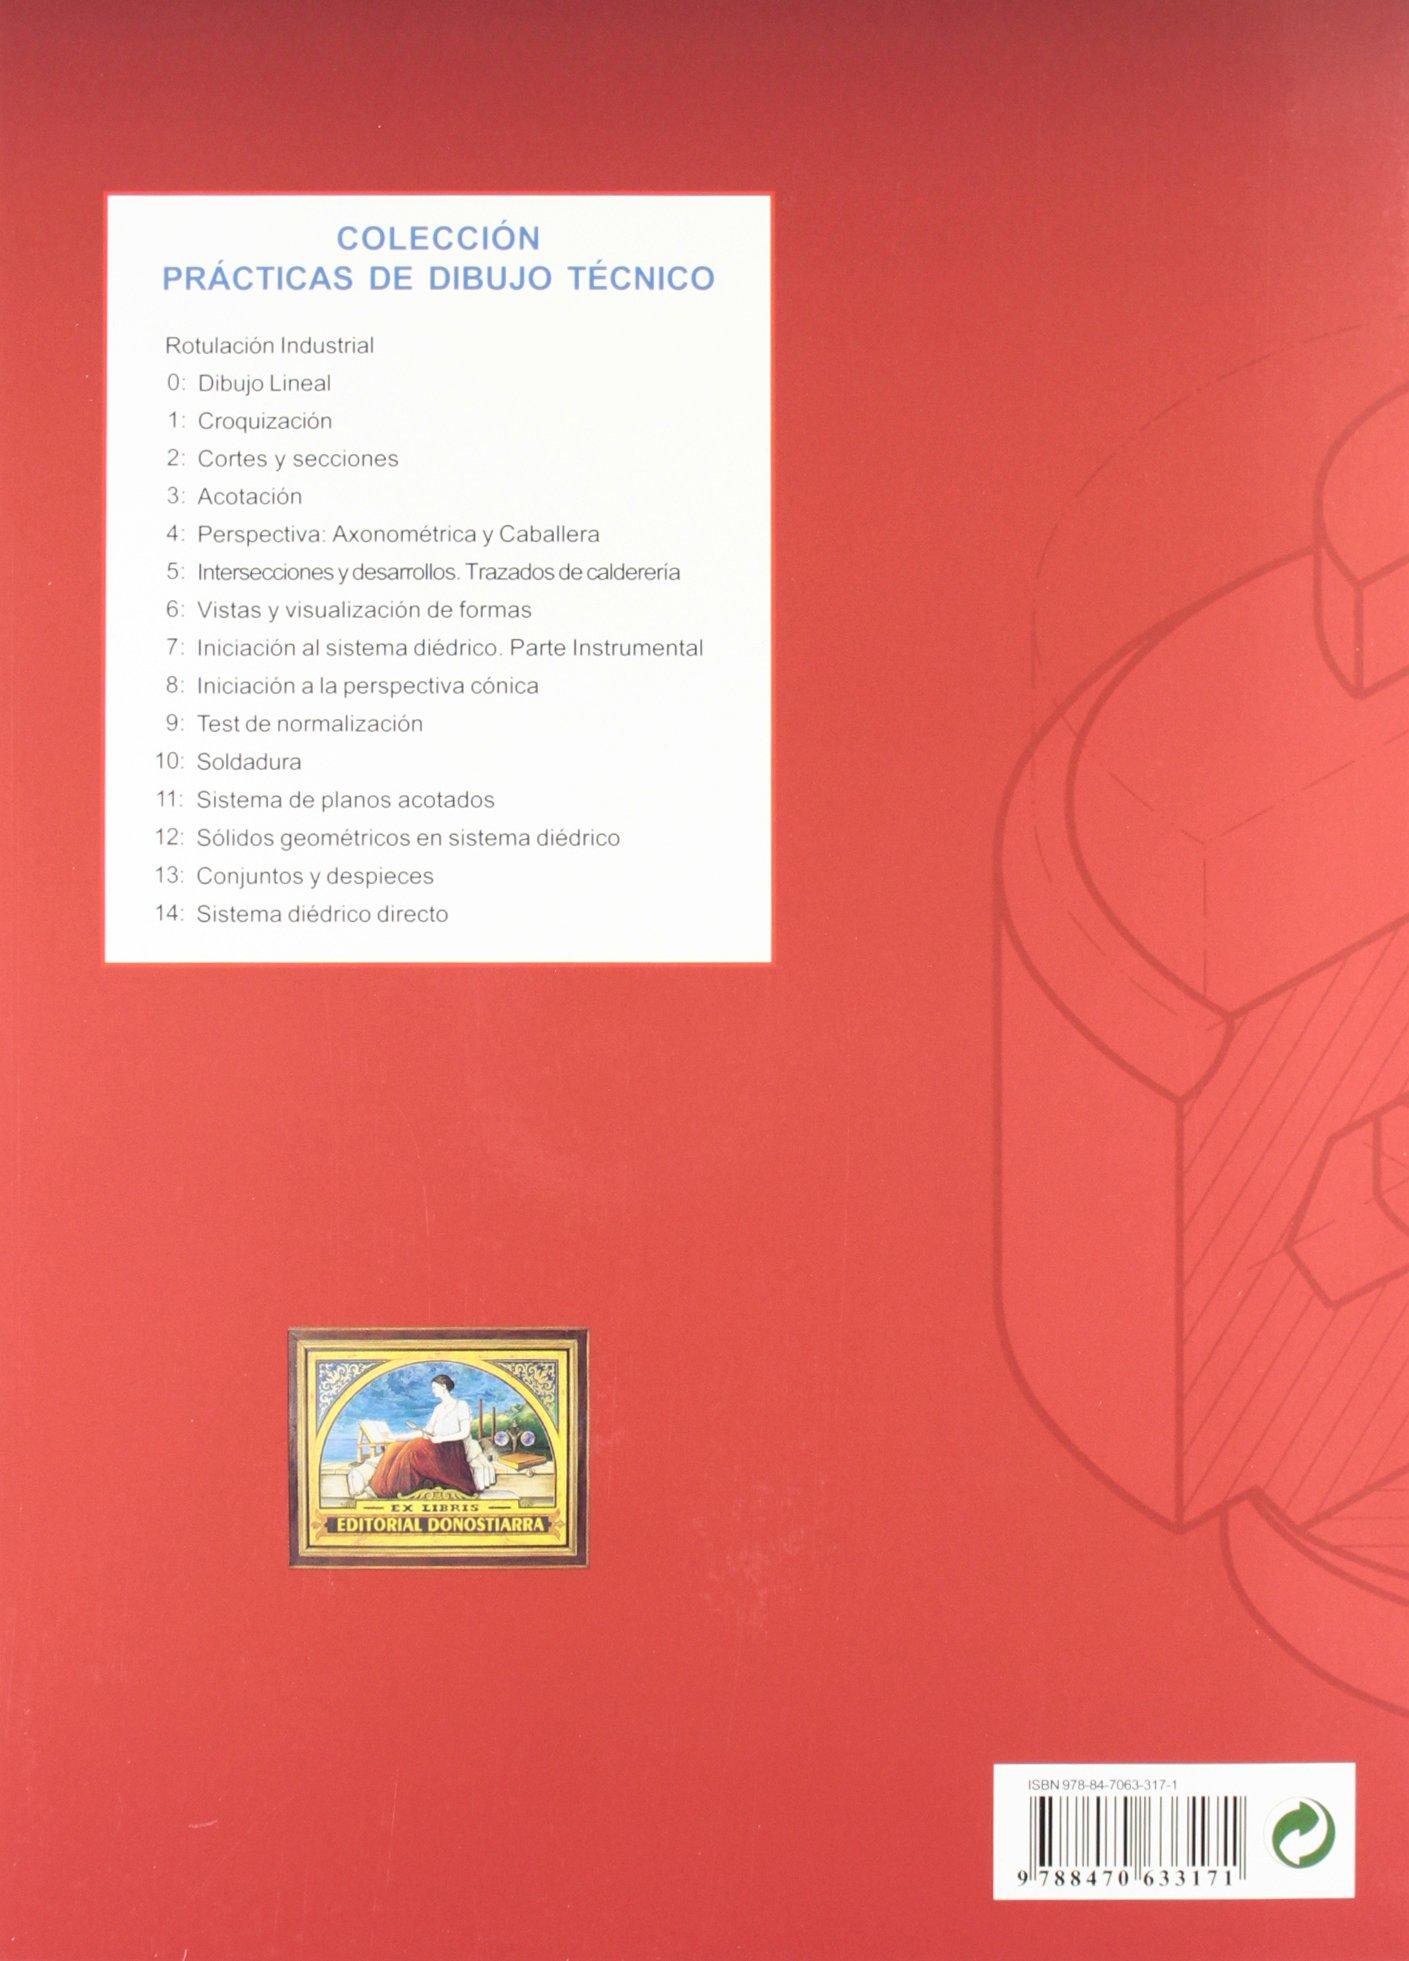 P.D.T. Nº 3: Acotación.: Joaquín Gonzalo Gonzalo: 9788470633171: Amazon.com: Books